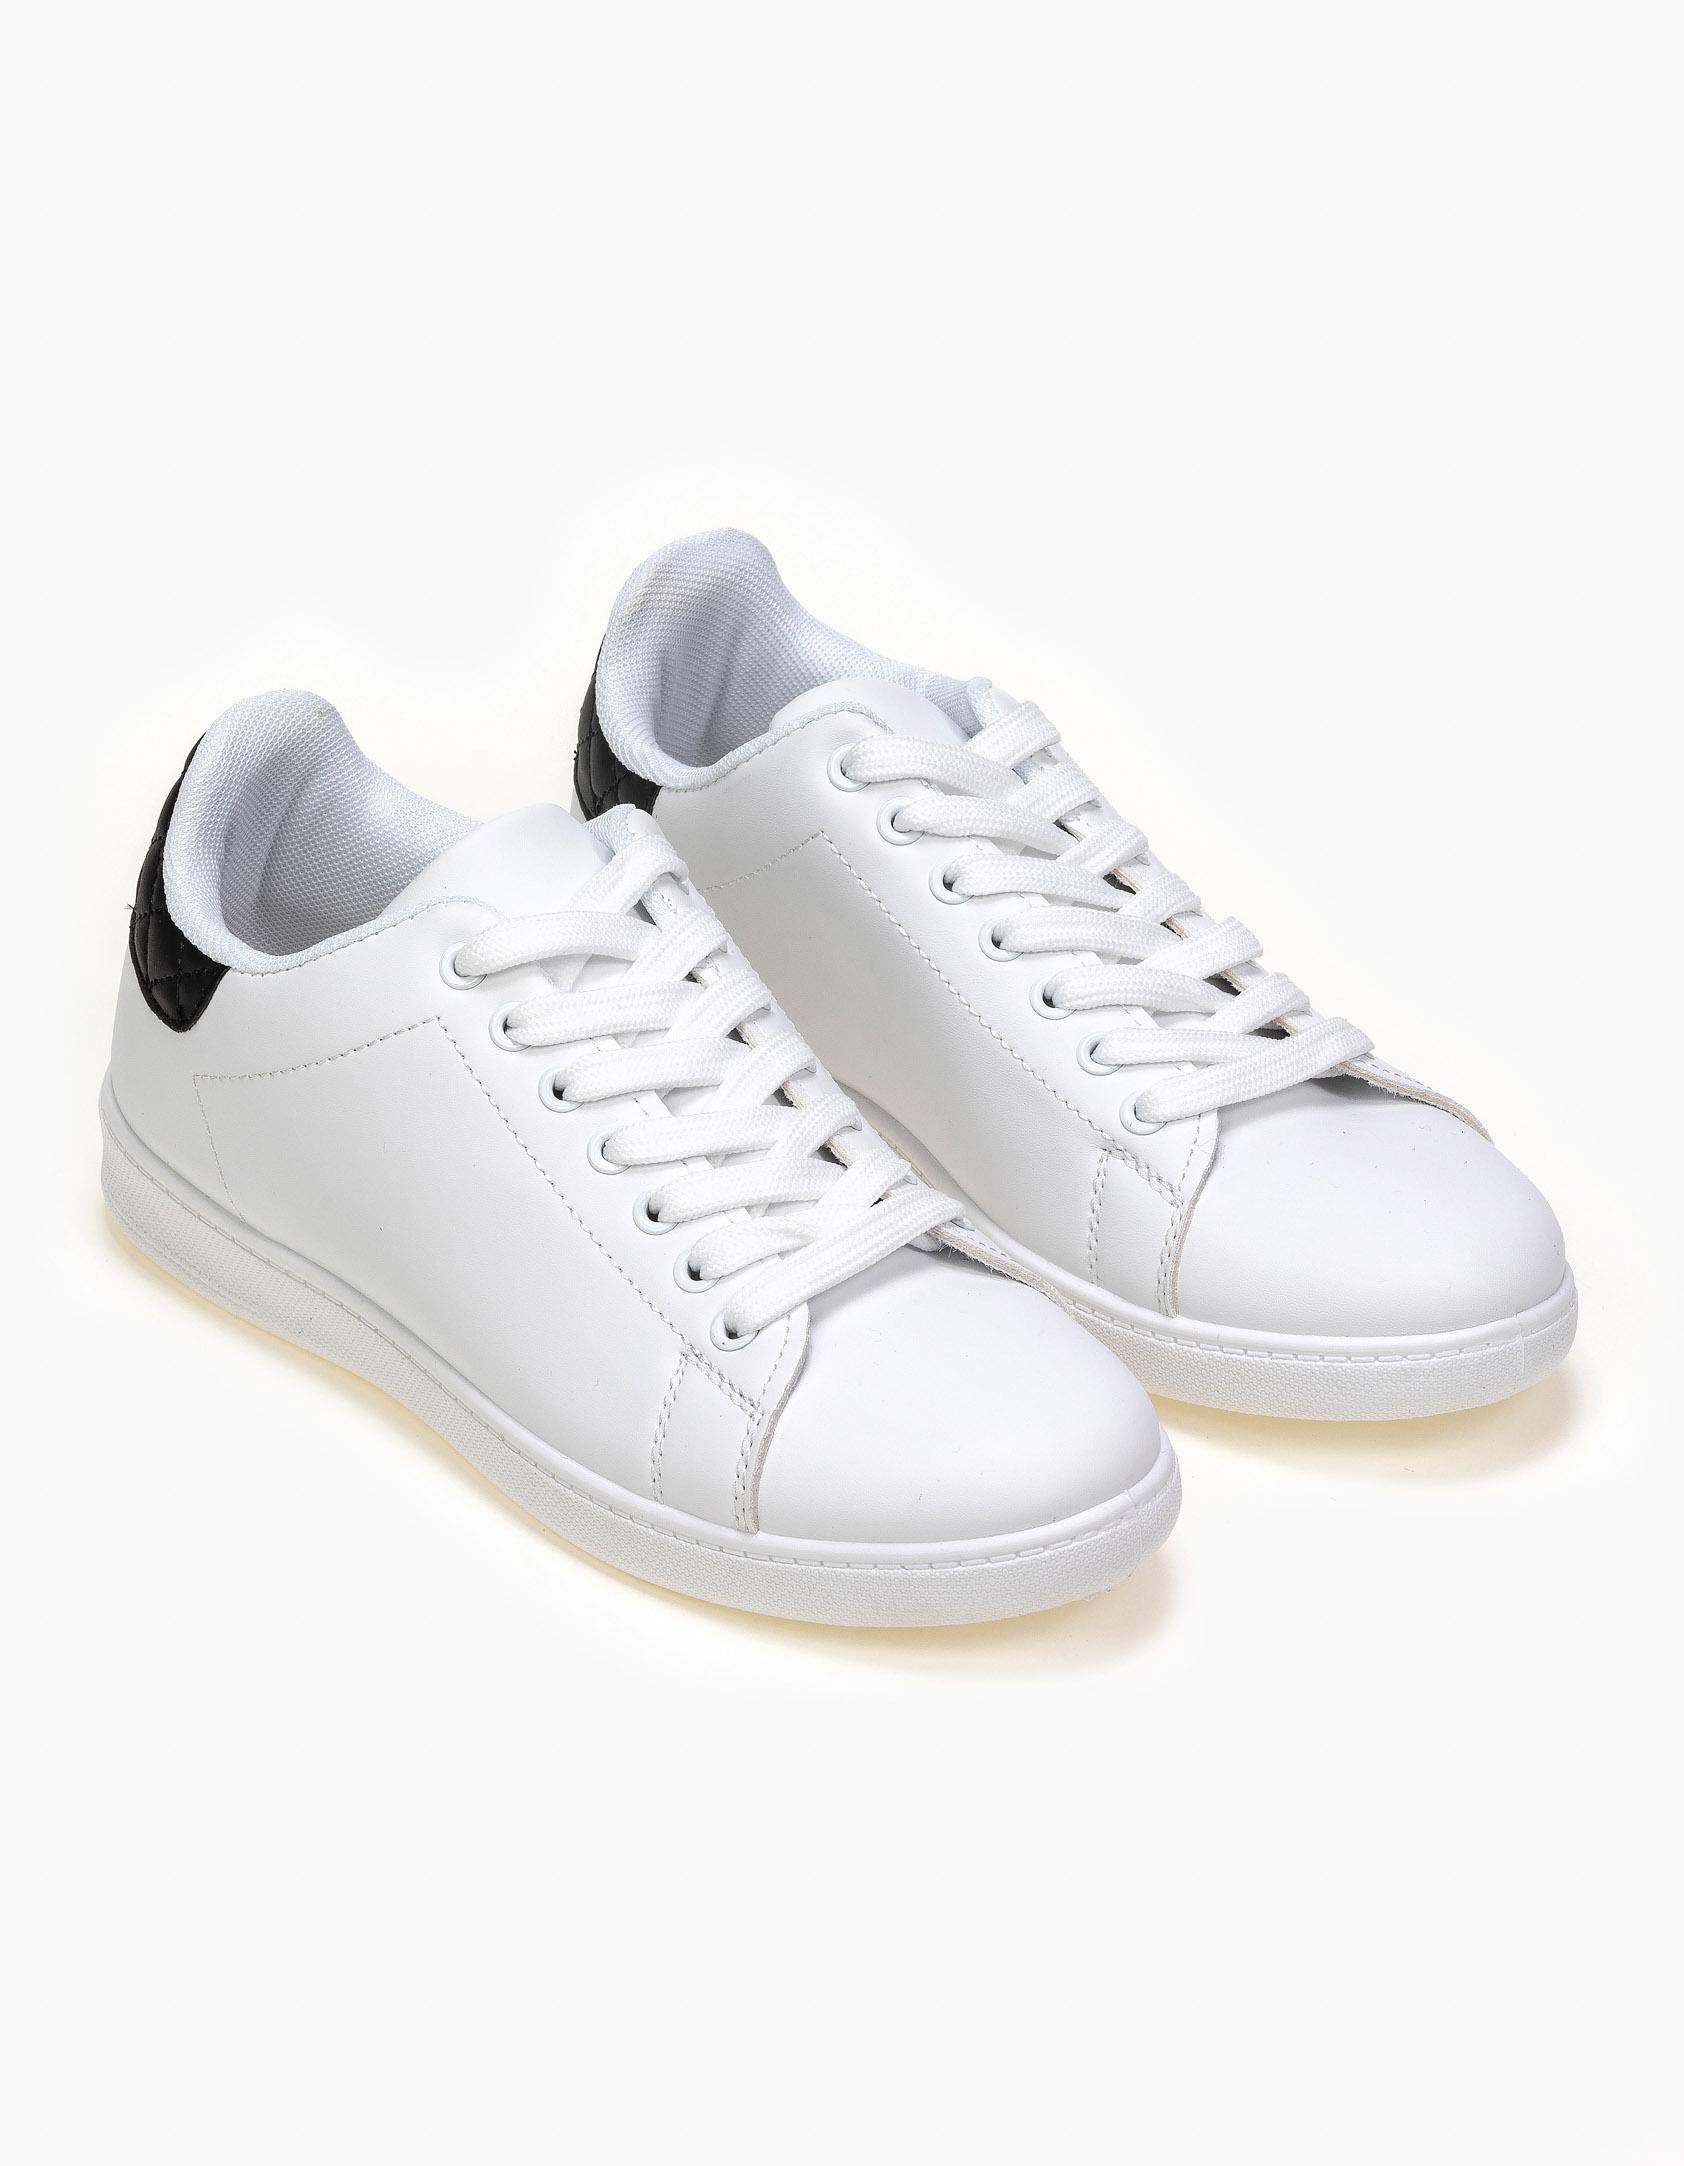 Sneakers με χρωματική καπιτονέ λεπτομέρειεα - Μαύρο